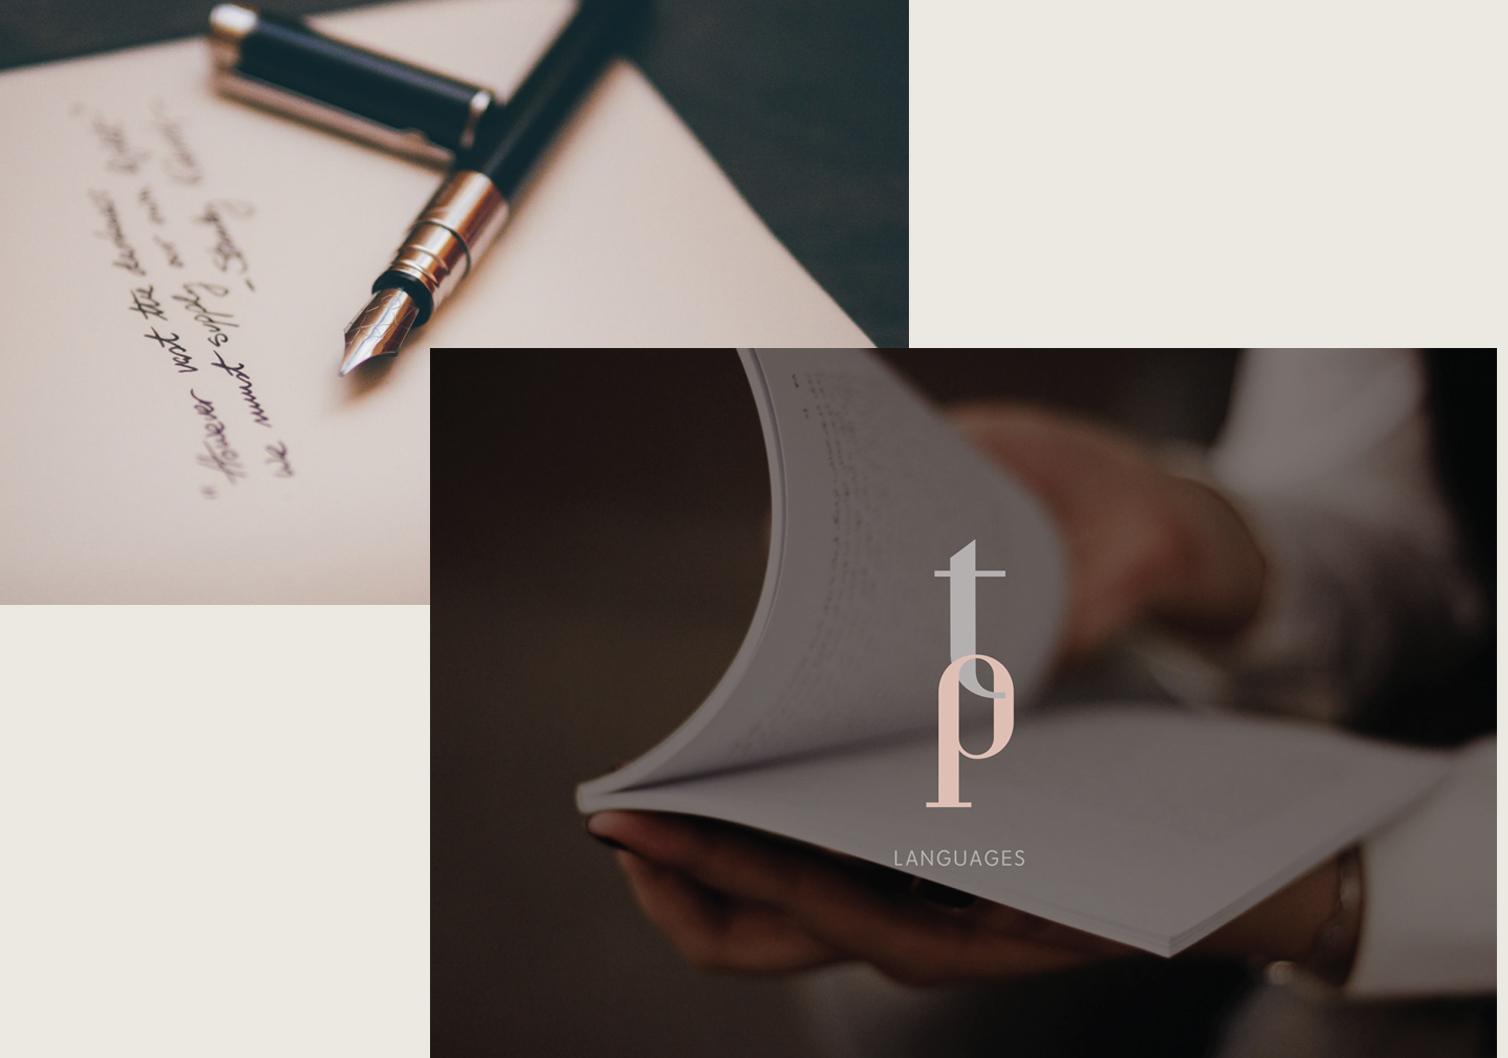 tp-languages-translations-lisbon-strawberry-brand-studio-logo-design.jpg